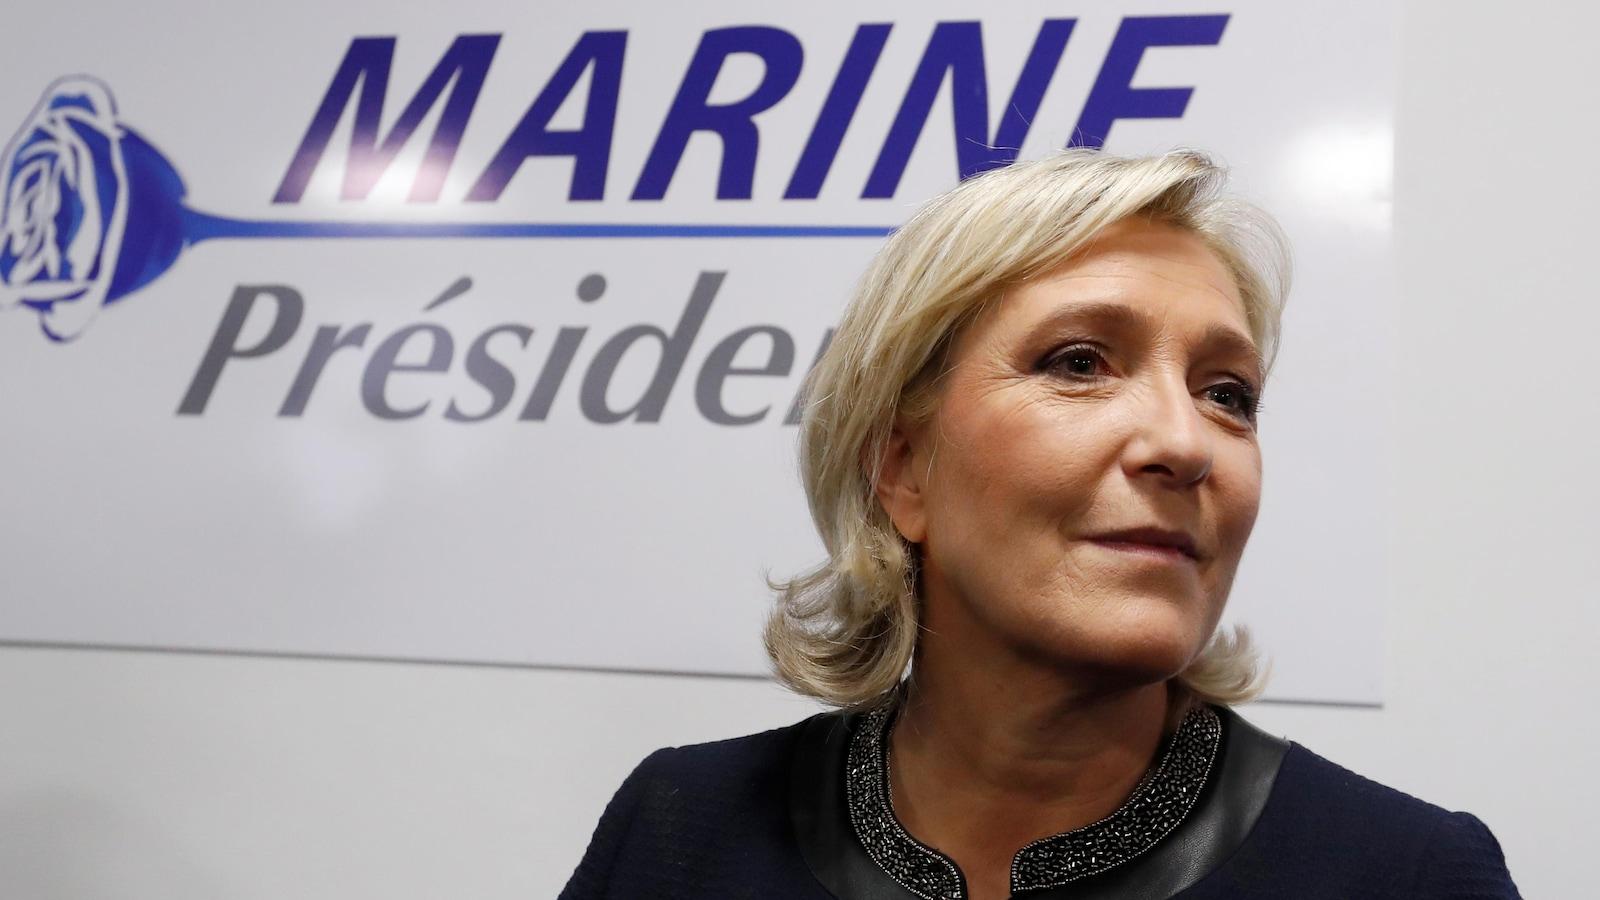 Marine Le Pen, Front national